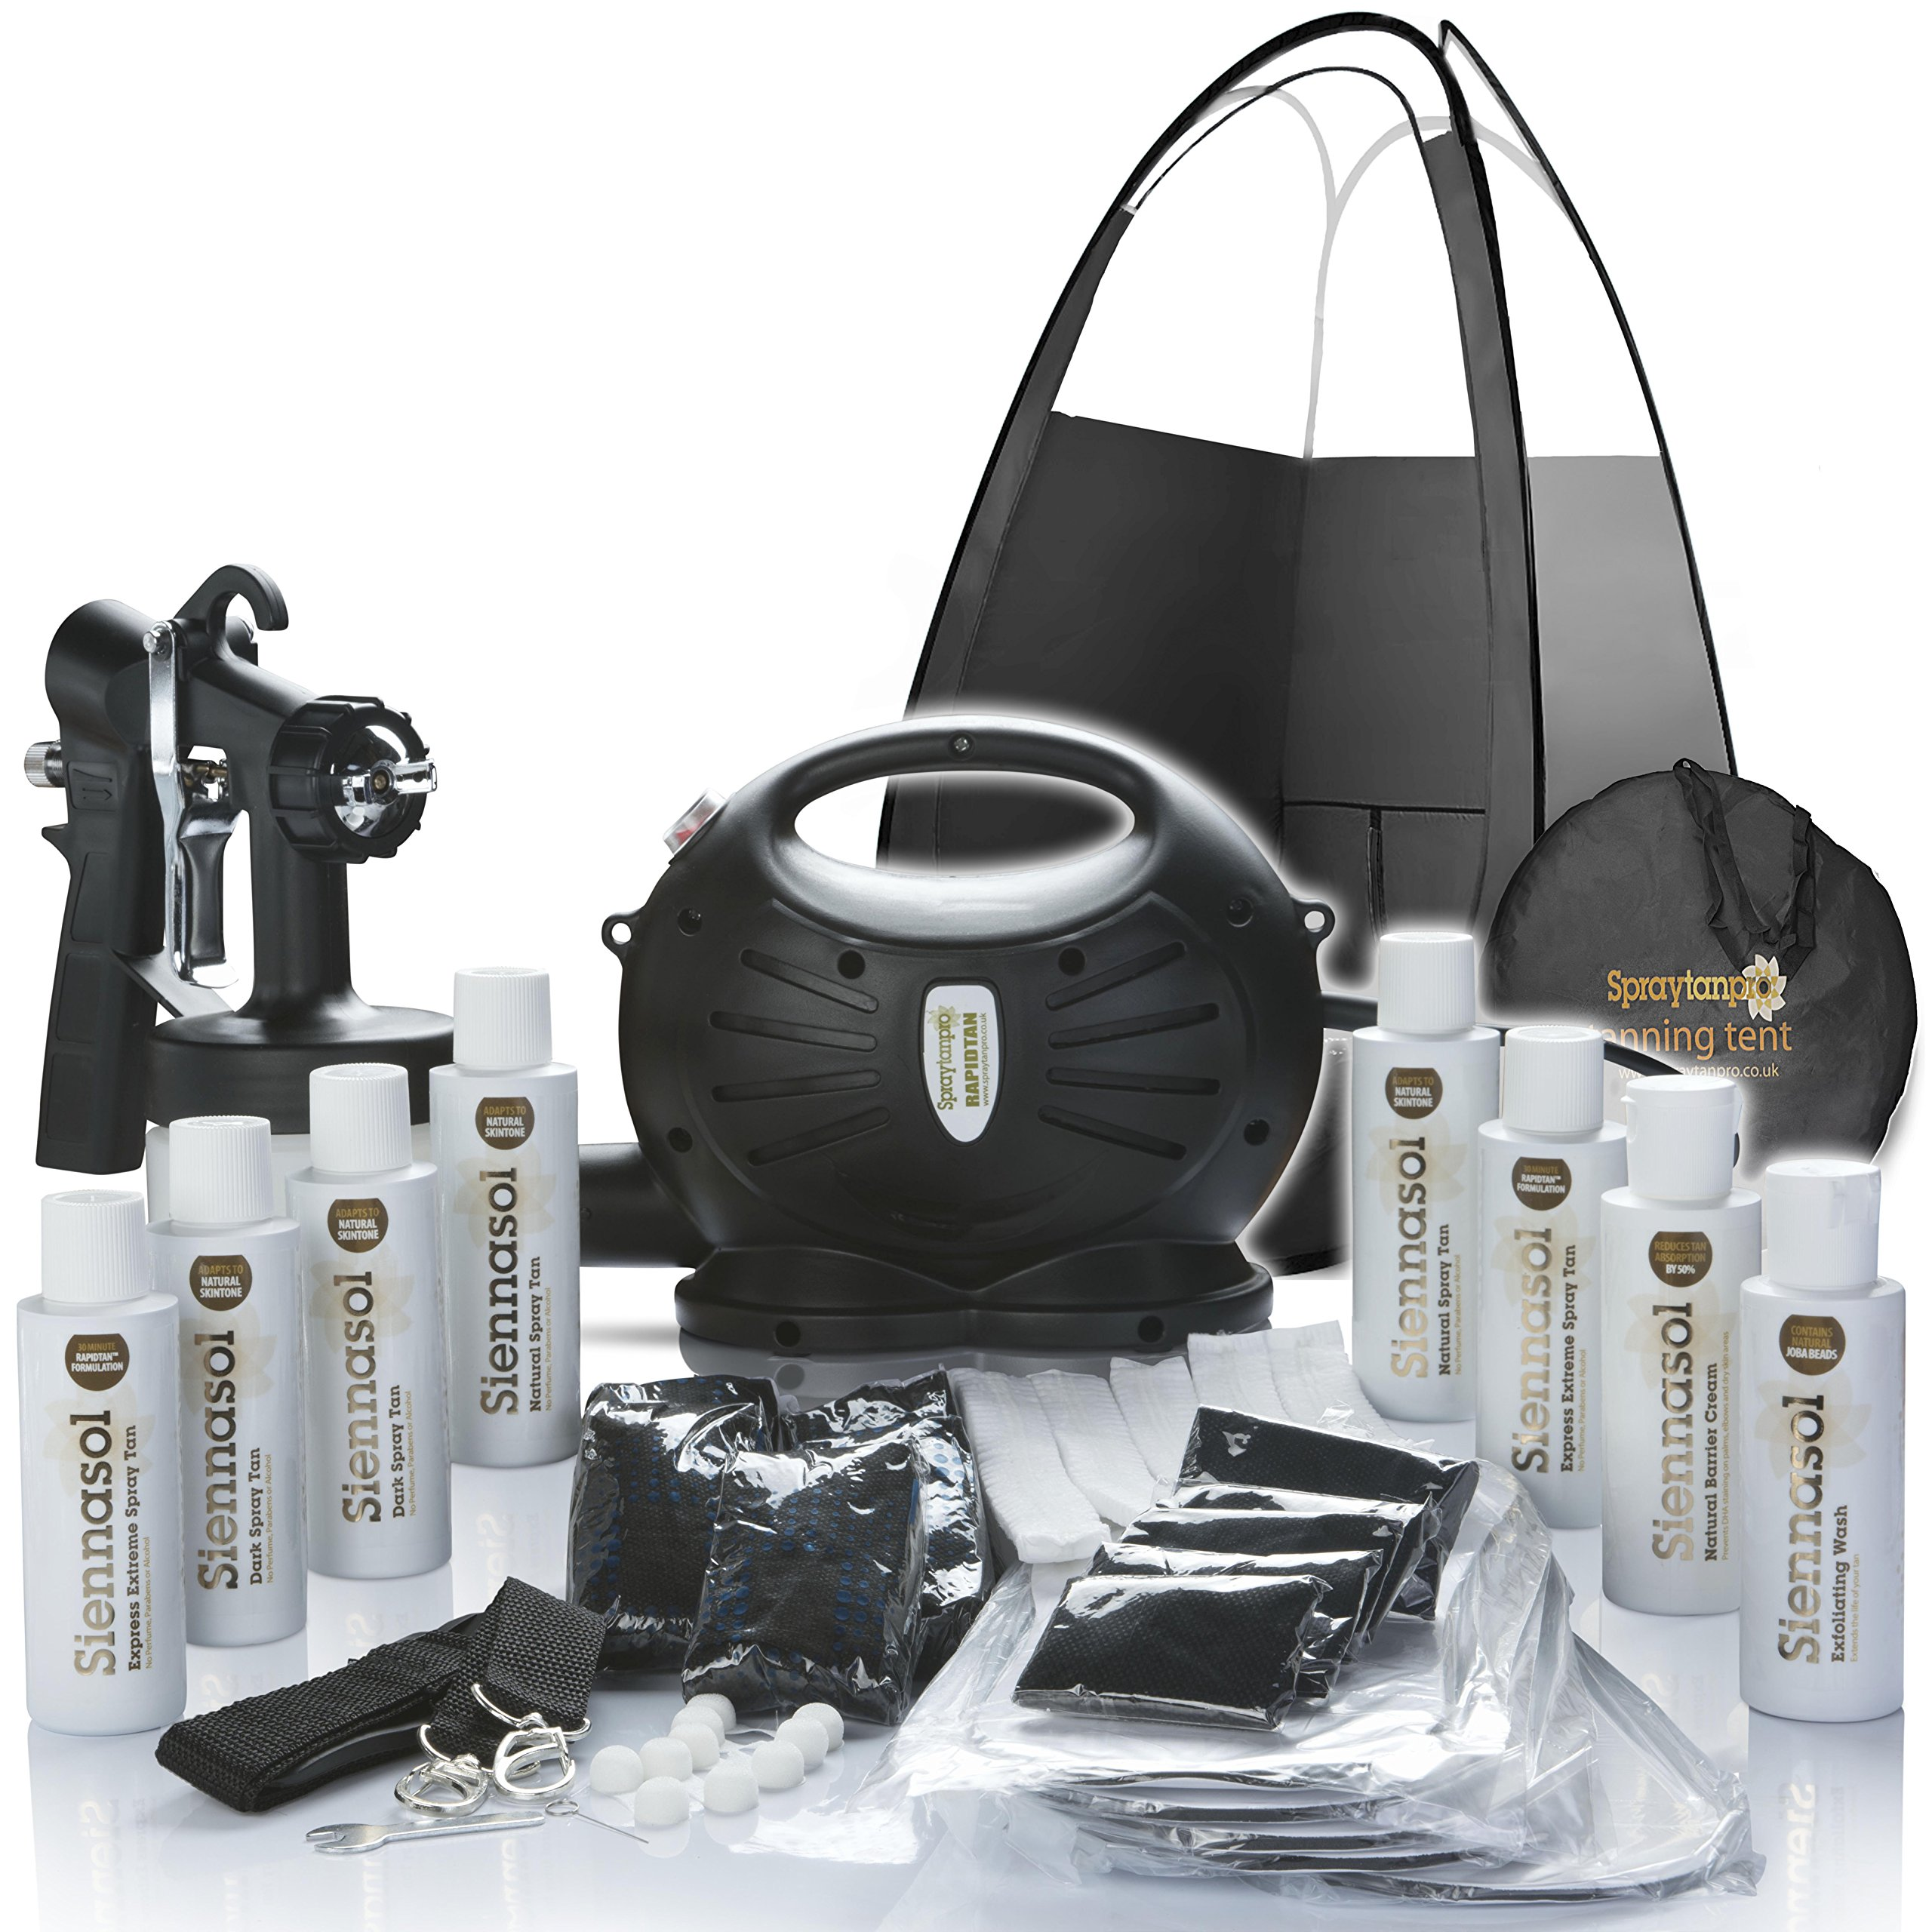 Rapidtan HVLP Airbrush Spray Tan Kit